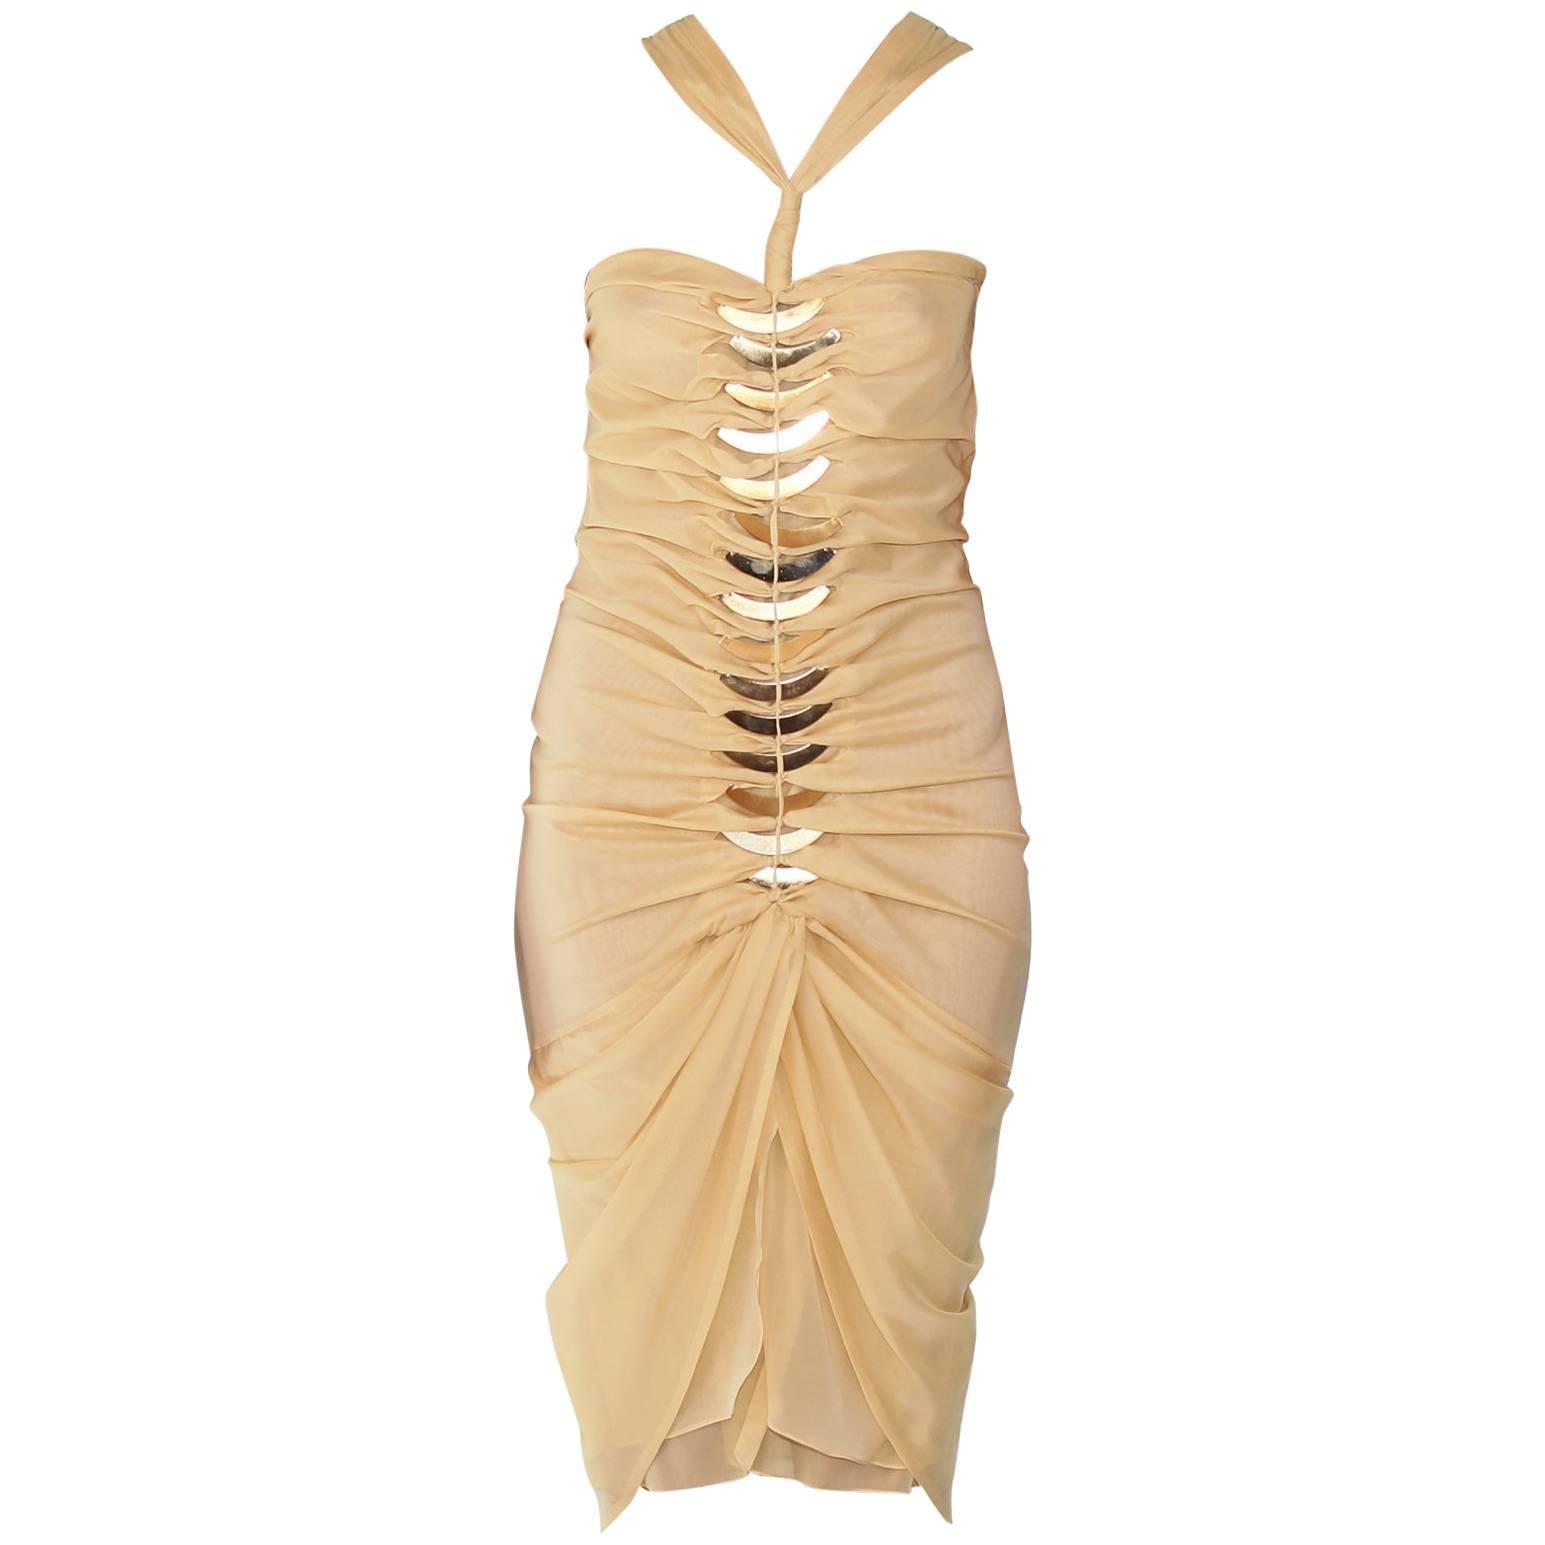 2004 Tom Ford for Gucci Embellished Silk Dress